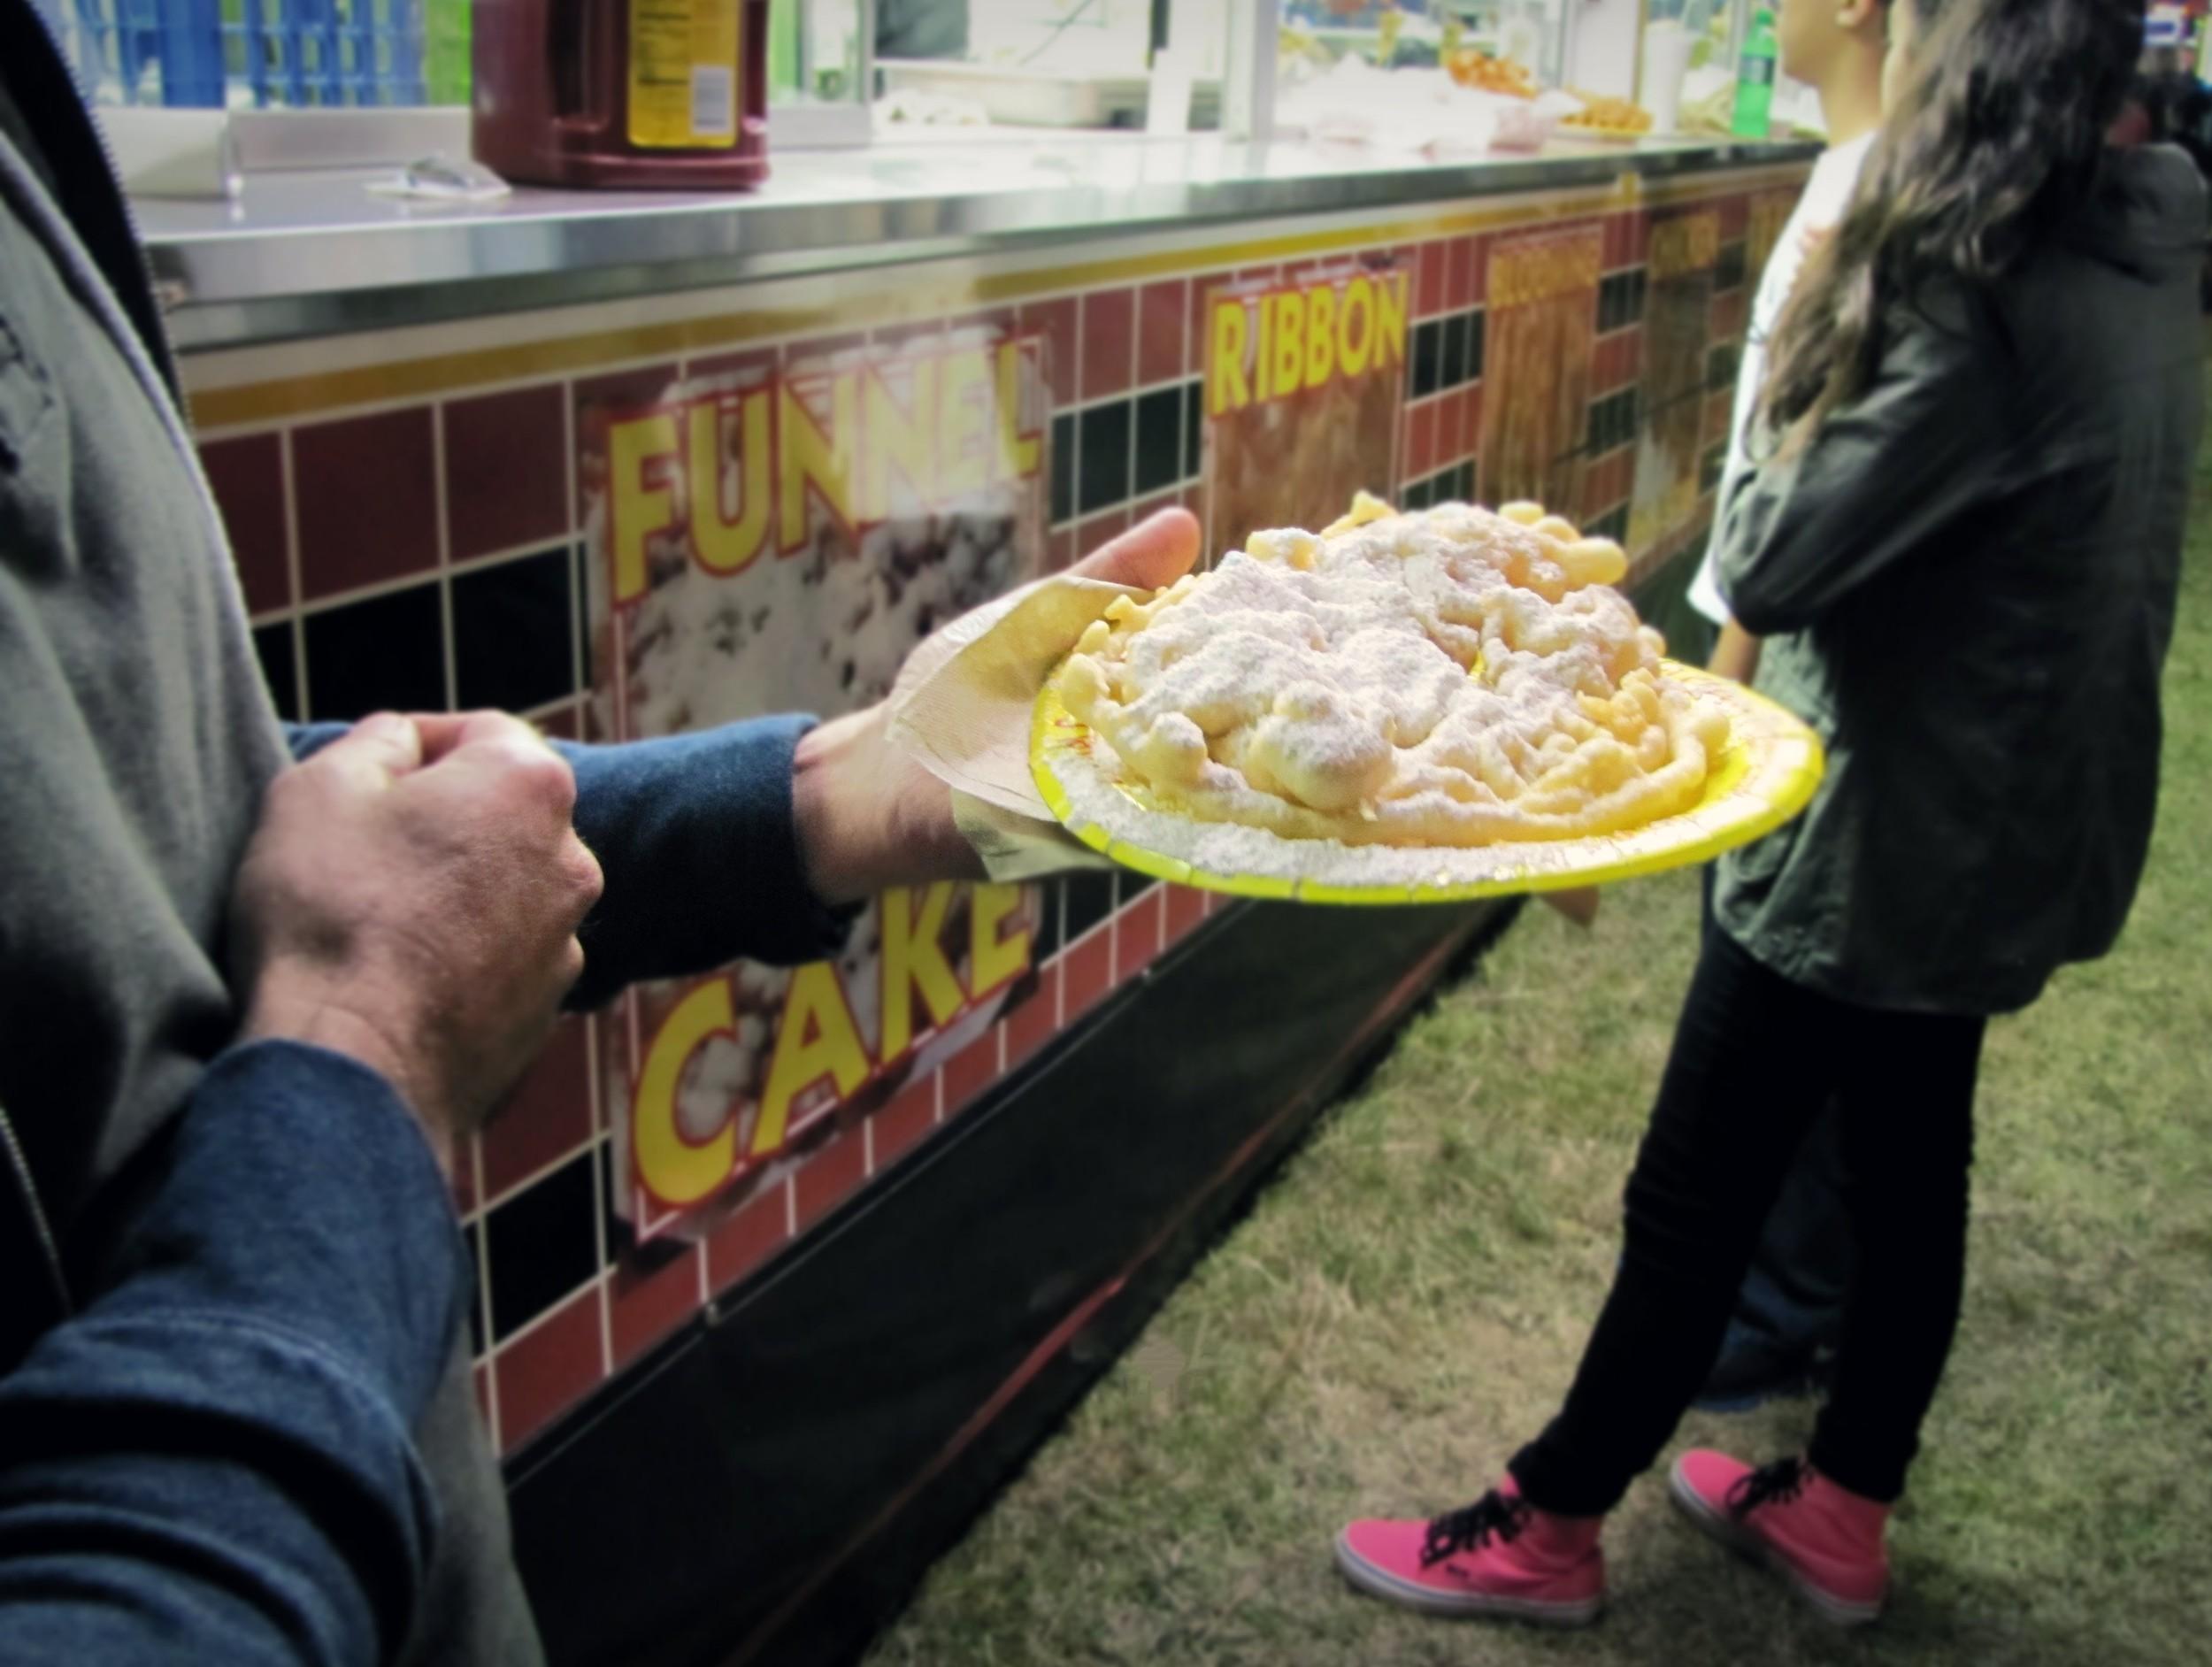 carnival funnel cake